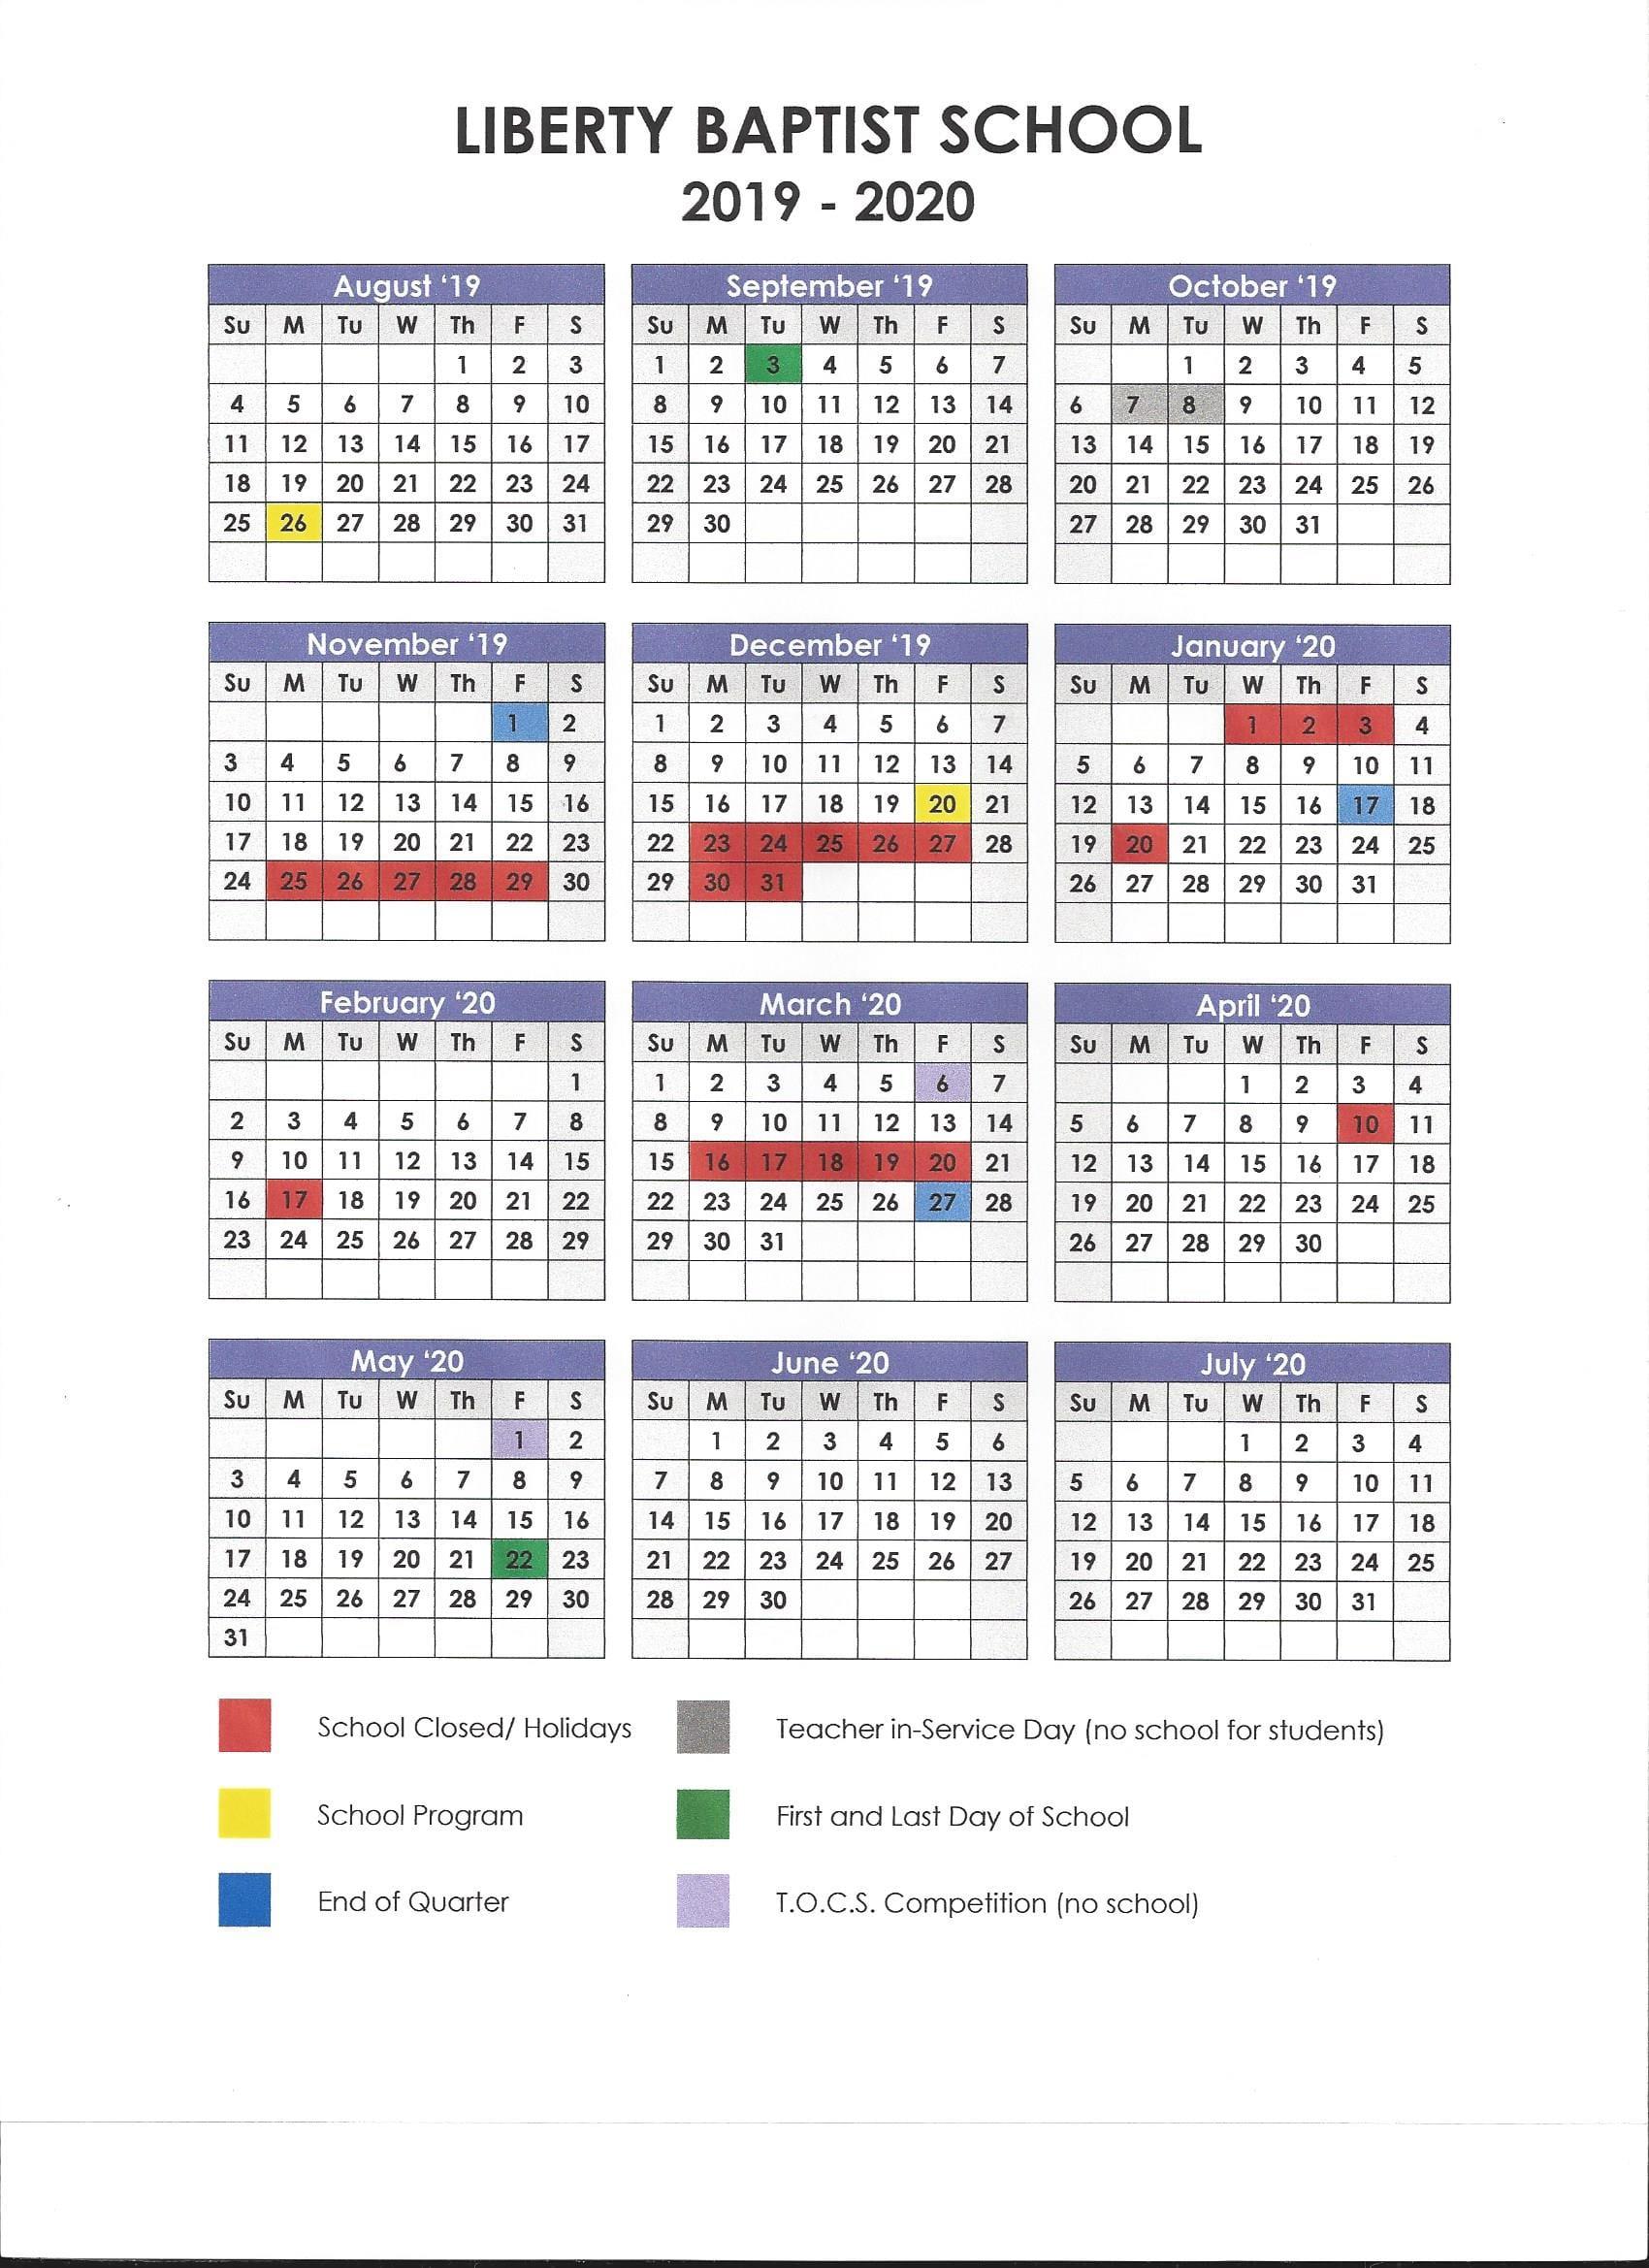 school-calendar-jpg